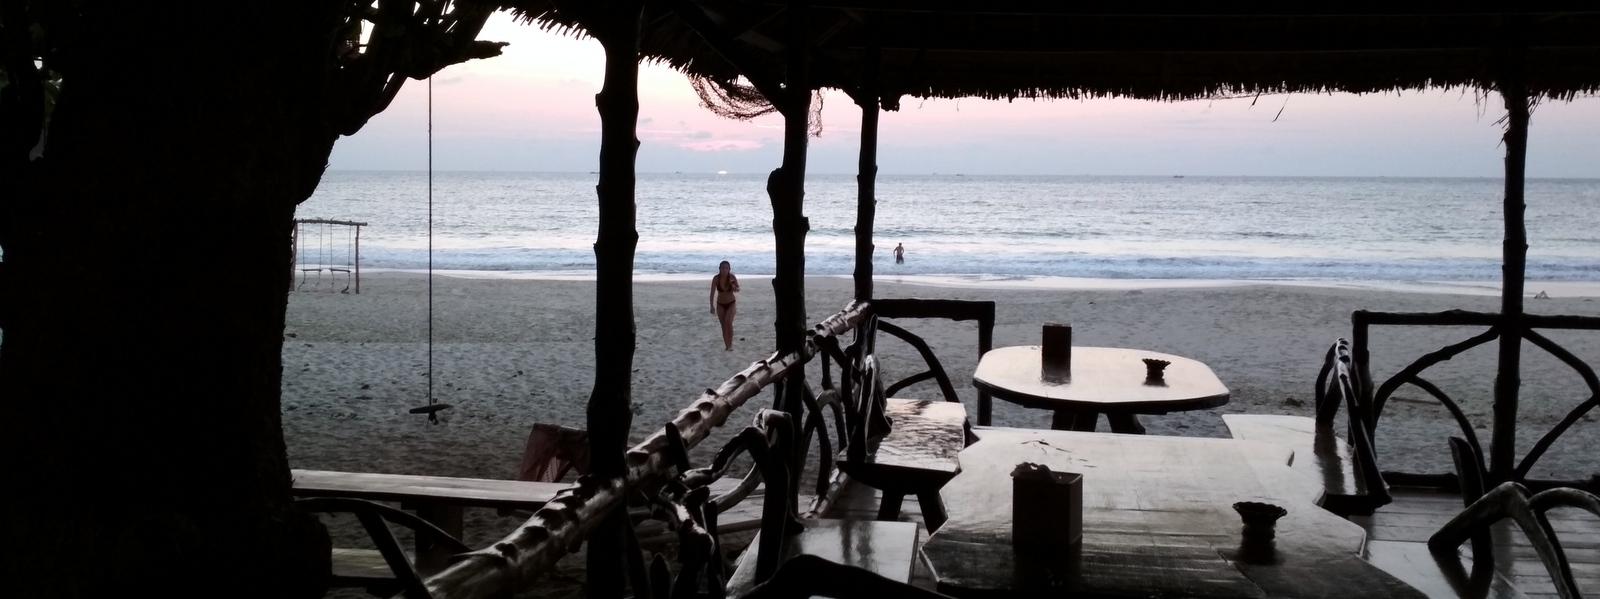 Dawei-Beach-Restaurant-Sin-Htauk